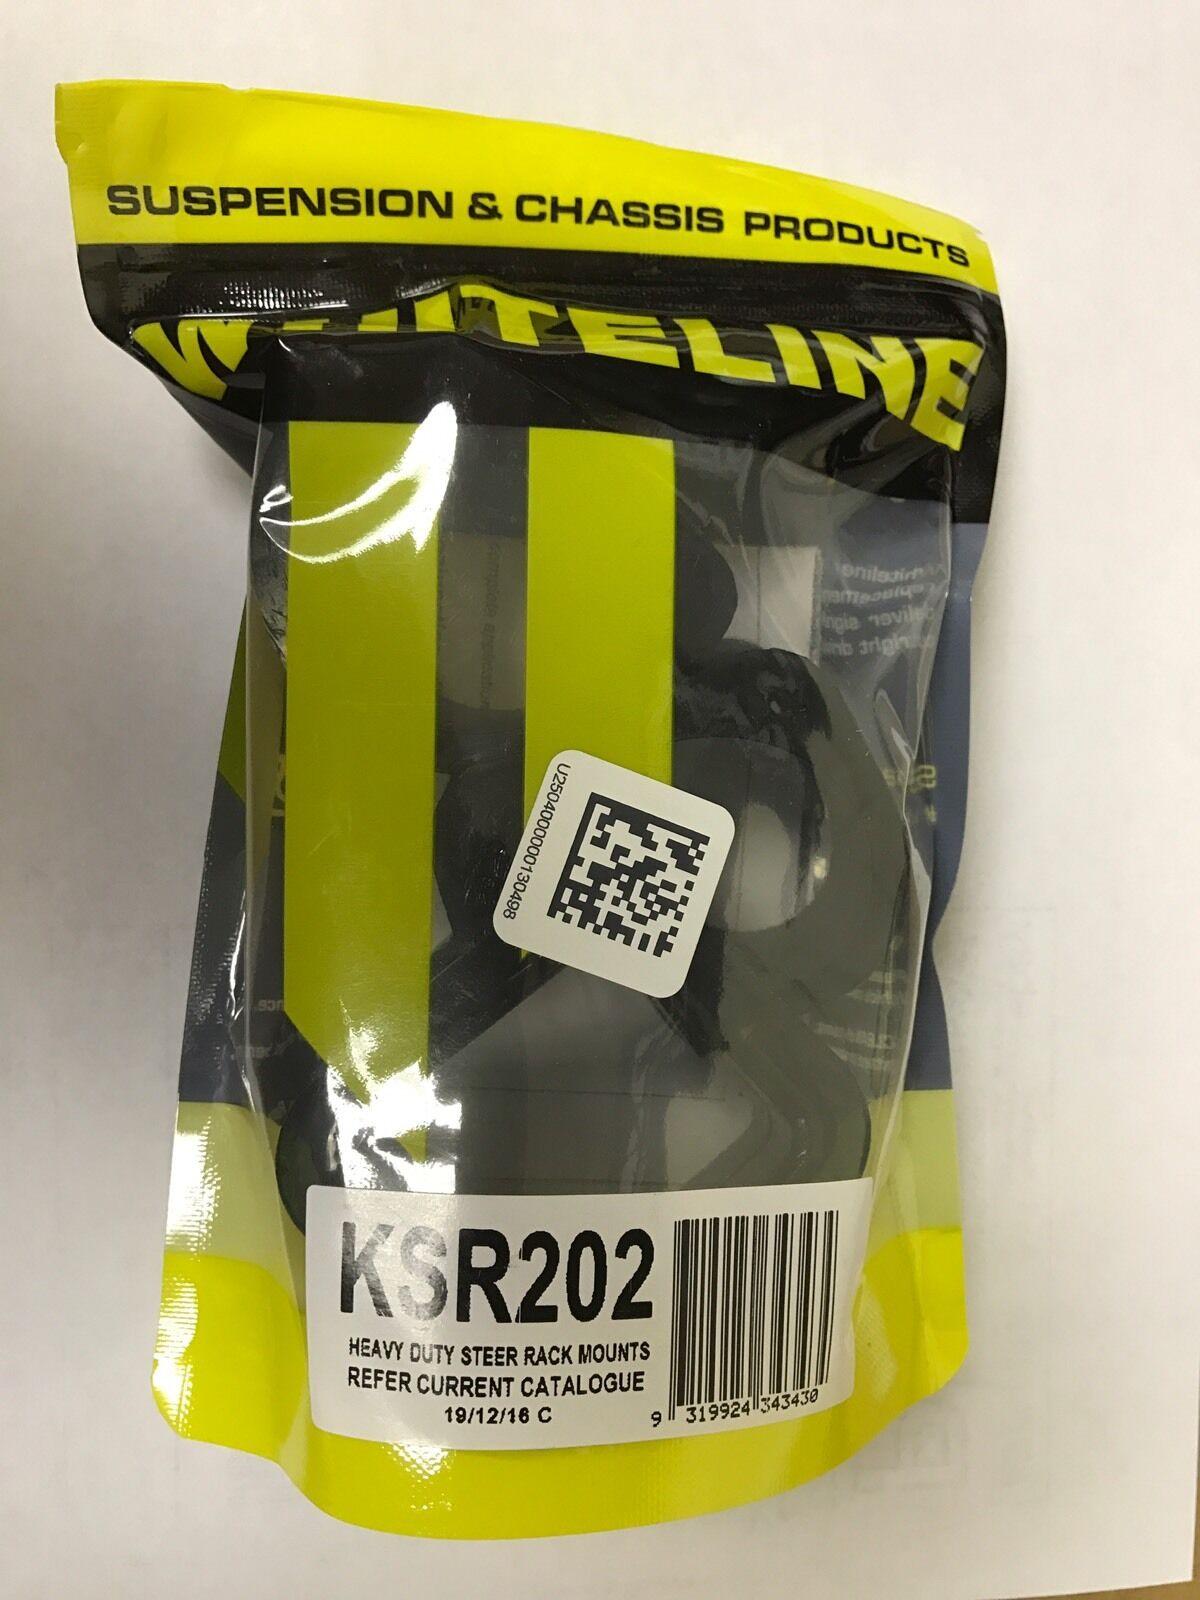 WHITELINE KSR202 HEAVY DUTY STEER RACK MOUNTS